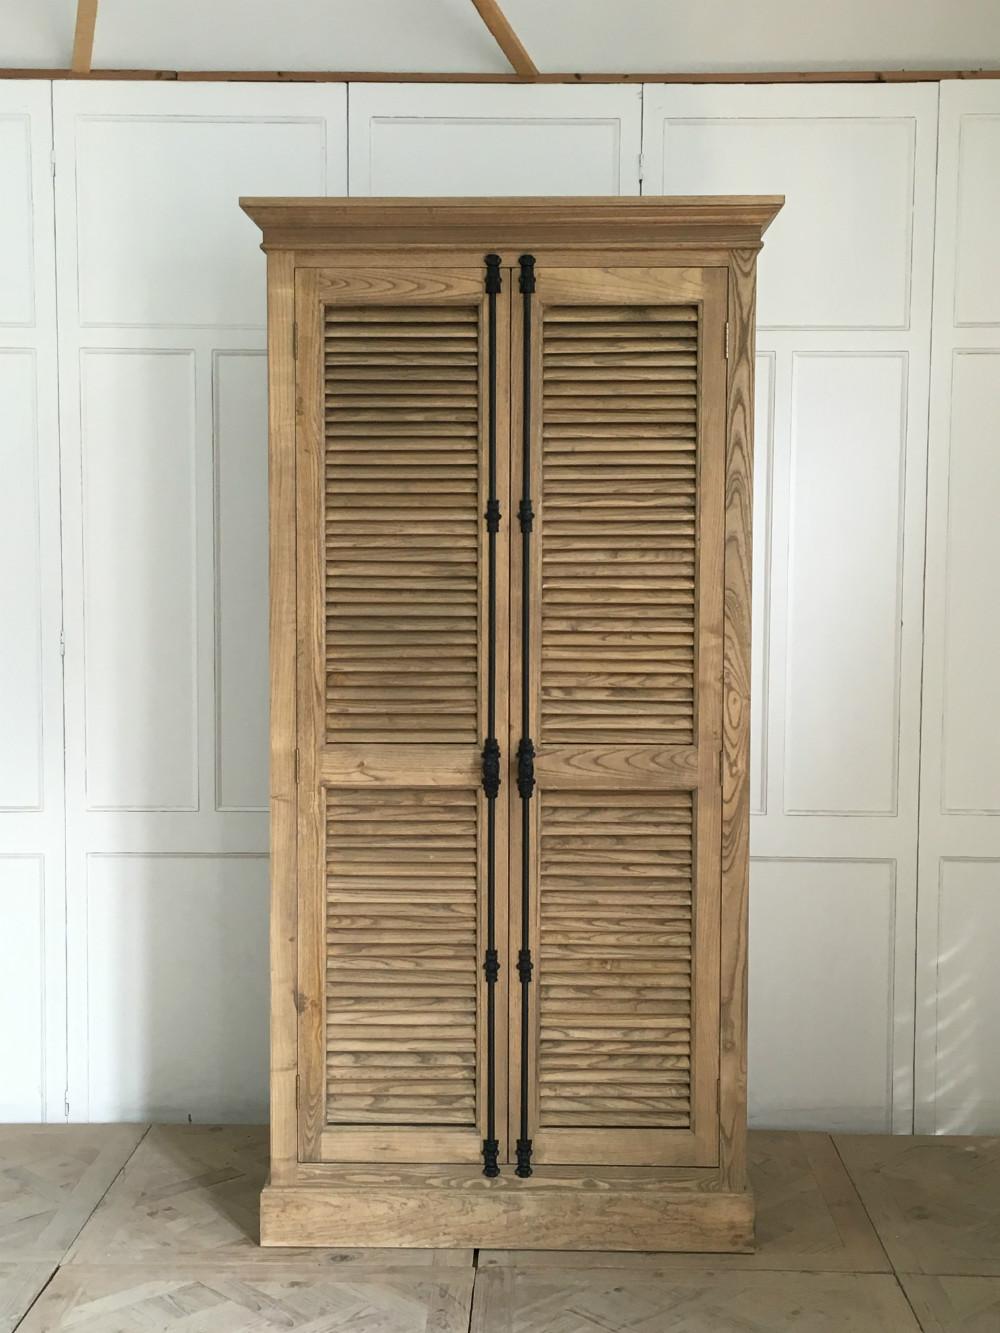 Living room vintage style tall wooden corner cabinet buy Tall corner cabinets for living room